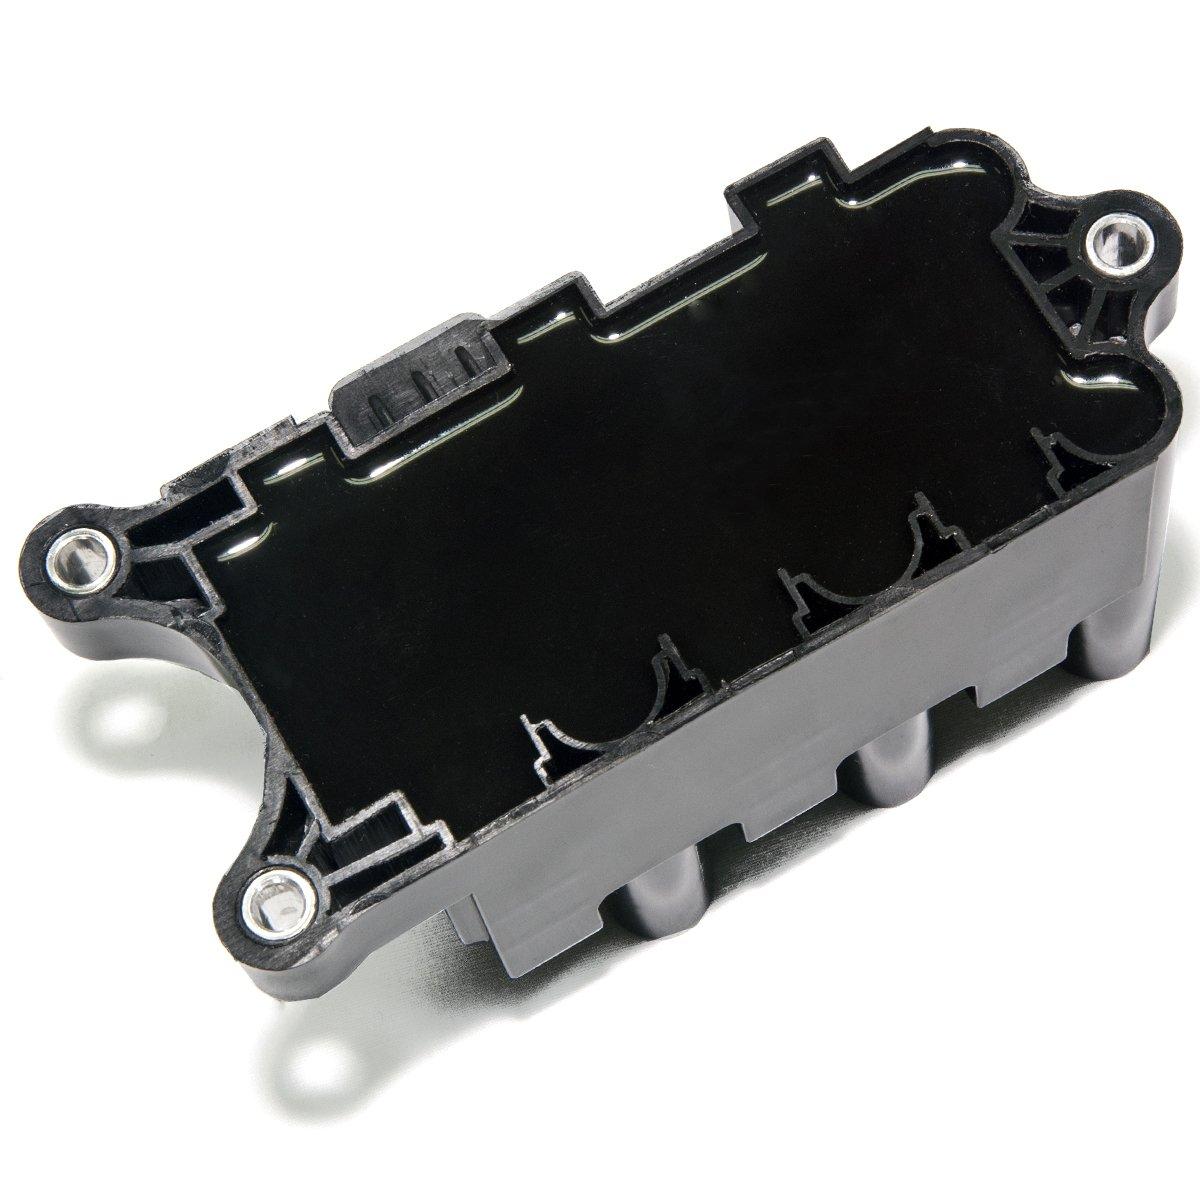 Brand New Ignition Coil Set For Ford Mazda Mercury V6 2003 Windstar Firing Order 39l 40l 42l 25l 30l 38l Compatible With C1312 Dg485 Fd498 Automotive